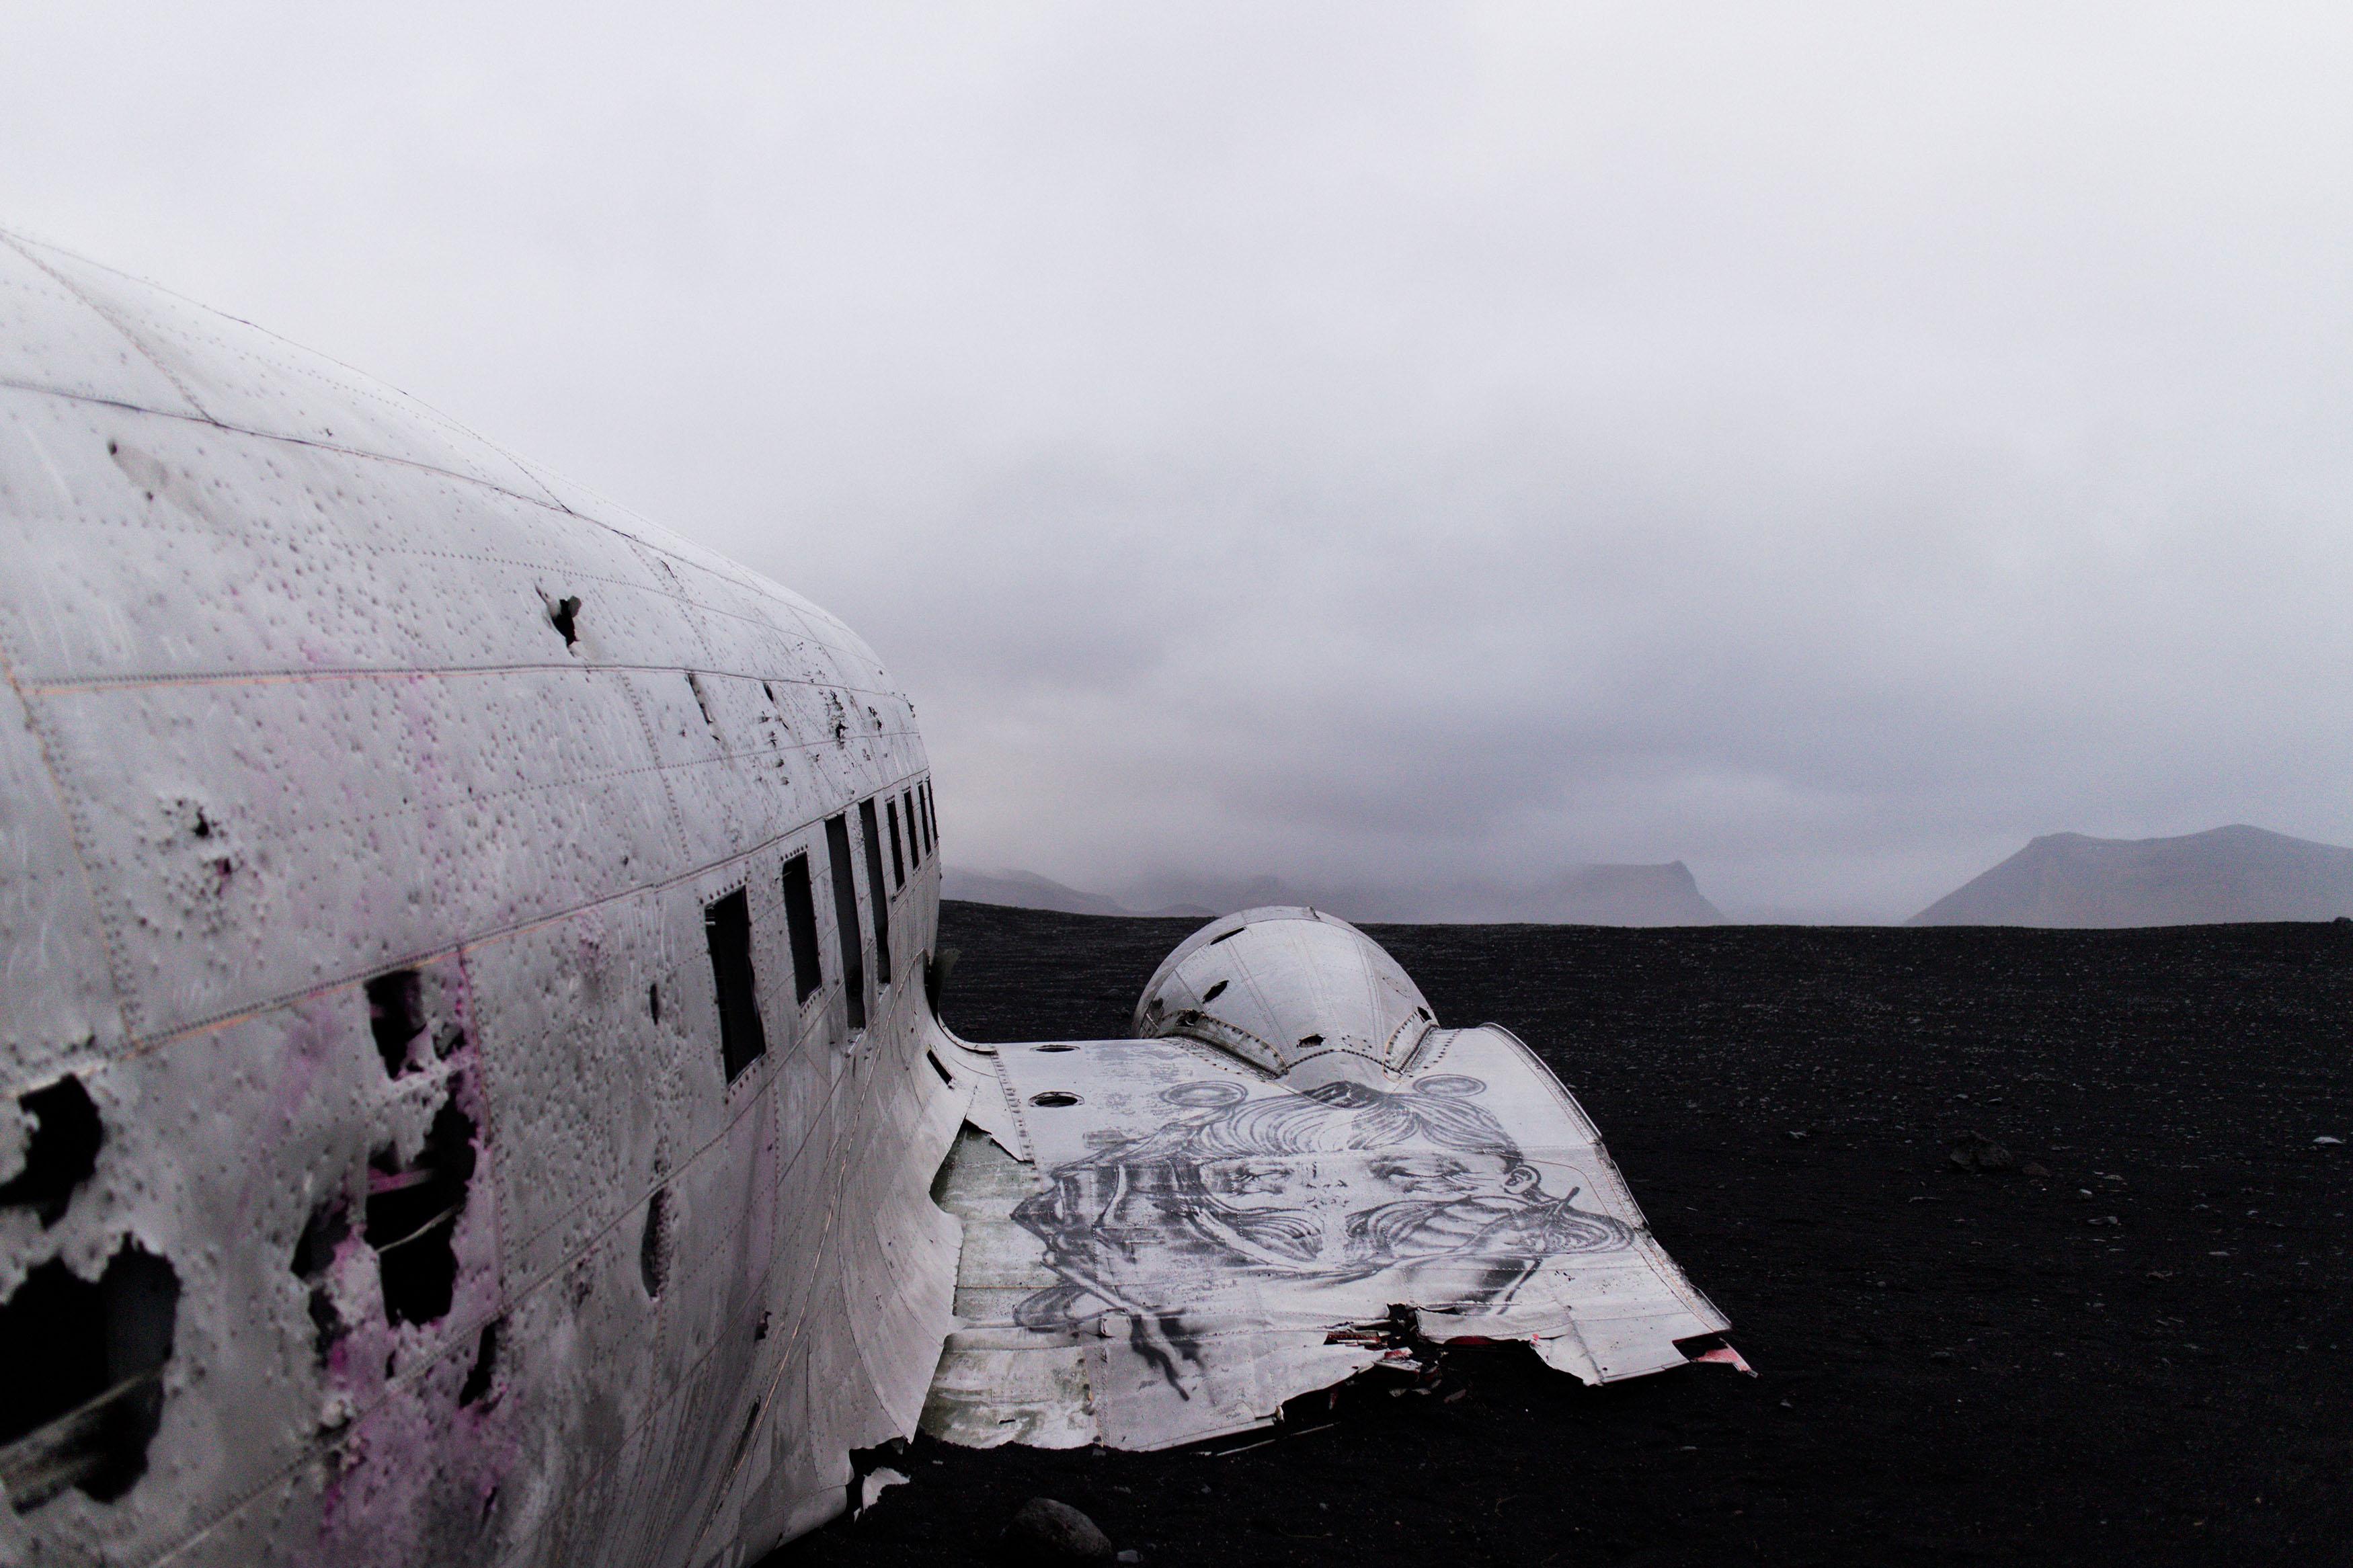 IHEARTALICE.DE – Fashion, Lifestyle & Travel-Diary by Alice M. Huynh from Berlin/Germany: Iceland Travel Diary / Black Sand Beach / Dc-3 Plane Wrackage on Sólheimasandur